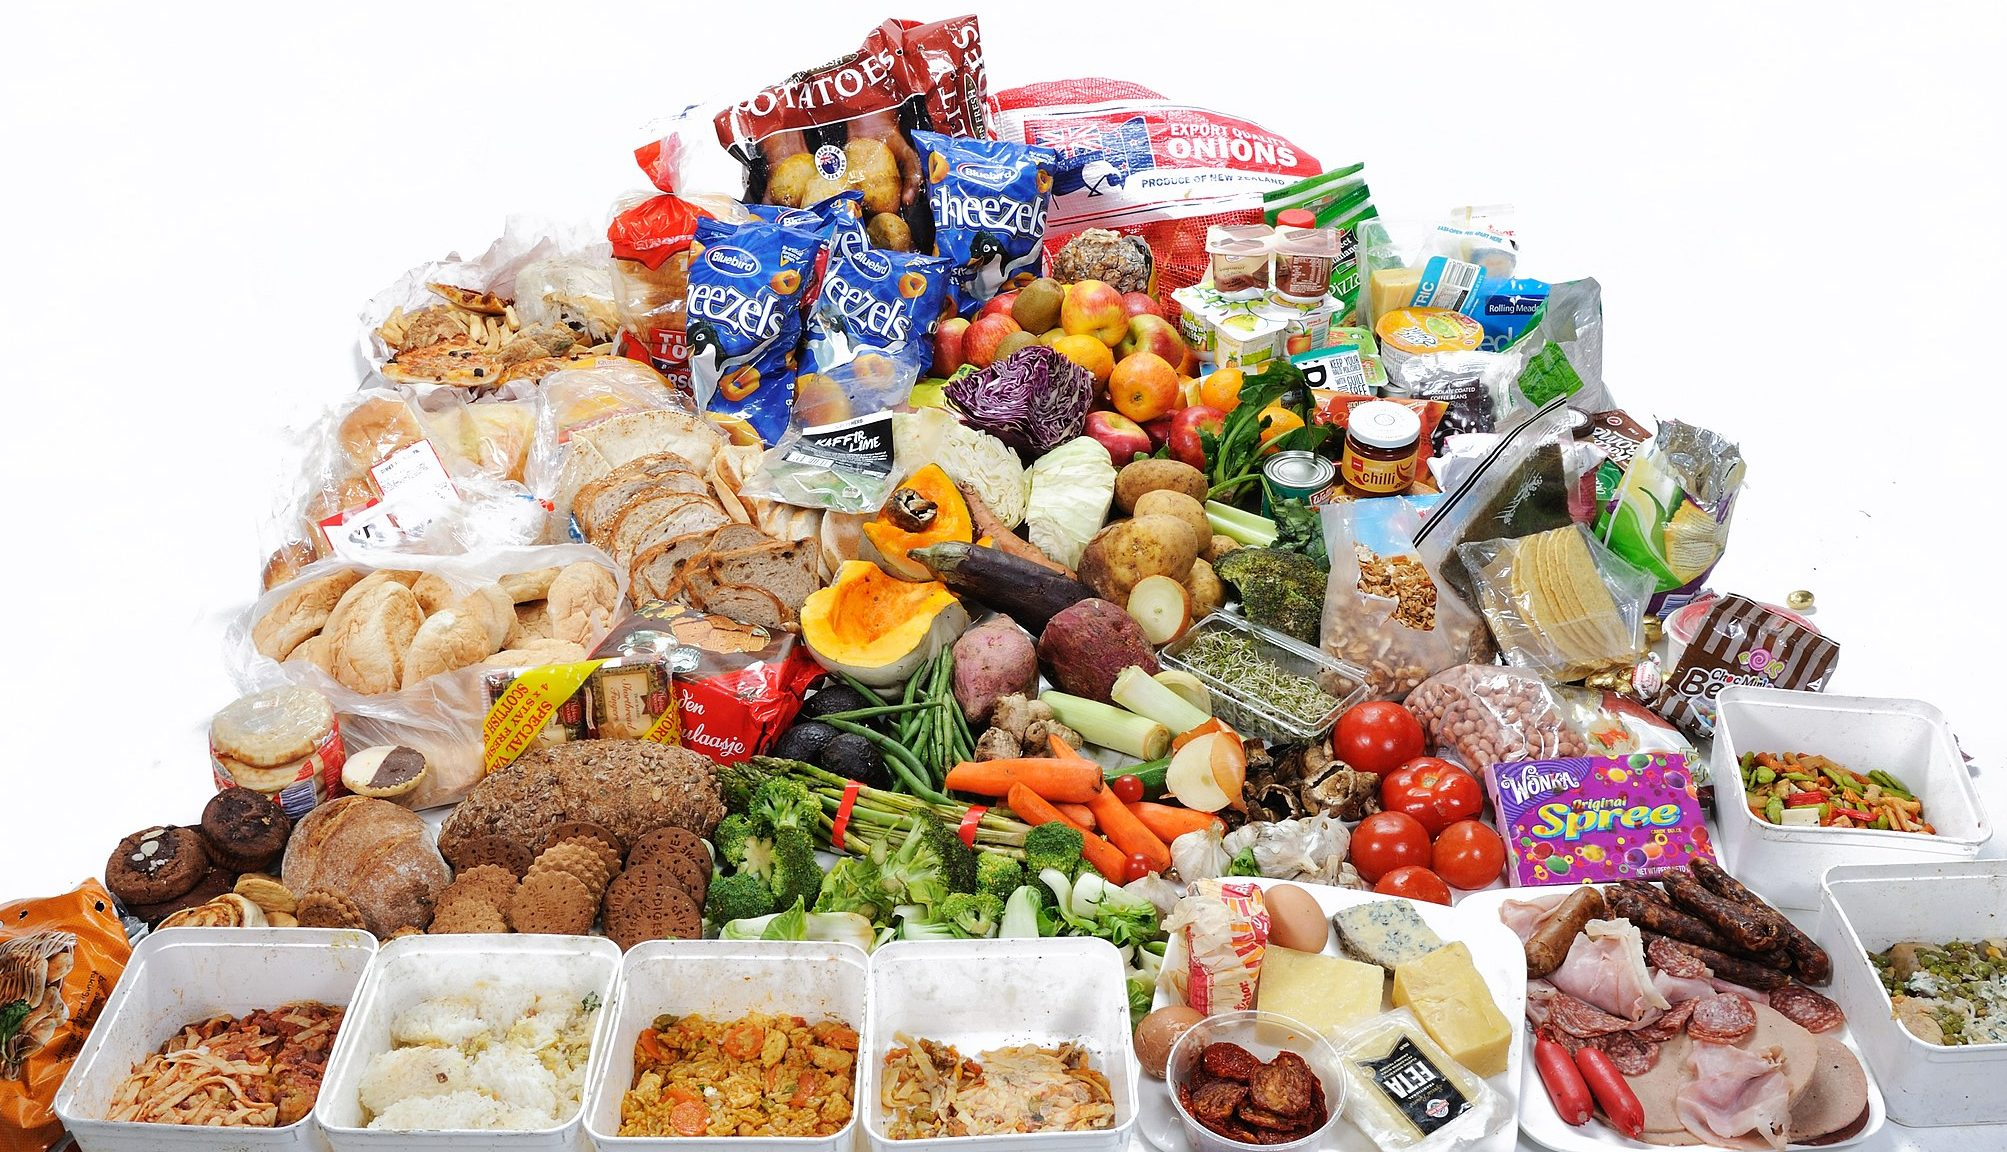 Disney Harvest Program food donation